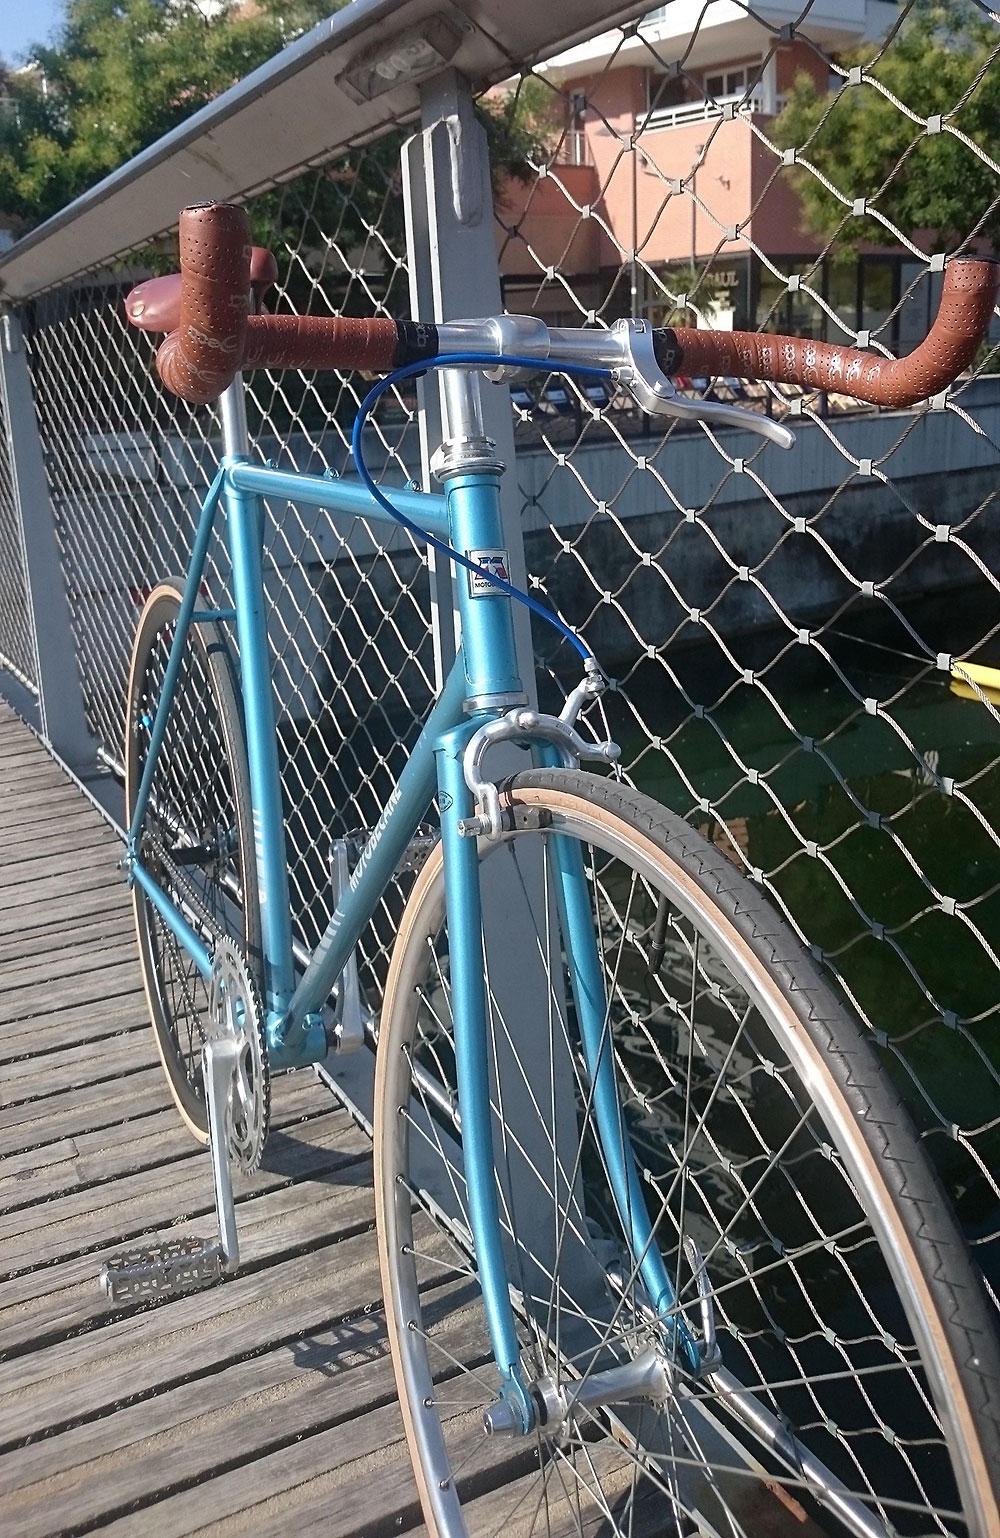 Vélo singlespeed Motobécane sur la base d'un ancien vélo de course